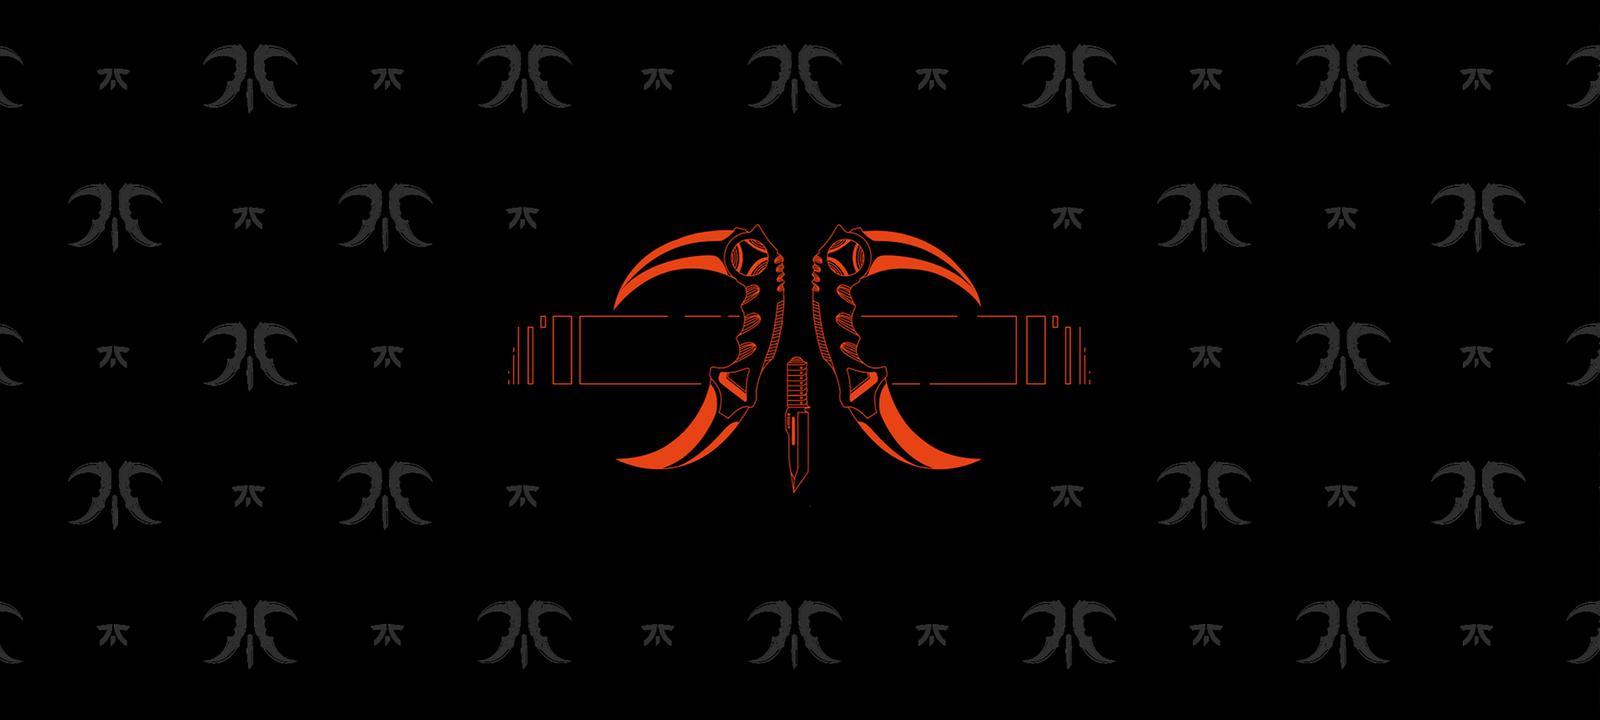 Fnatic Knifnatic CS:GO pattern